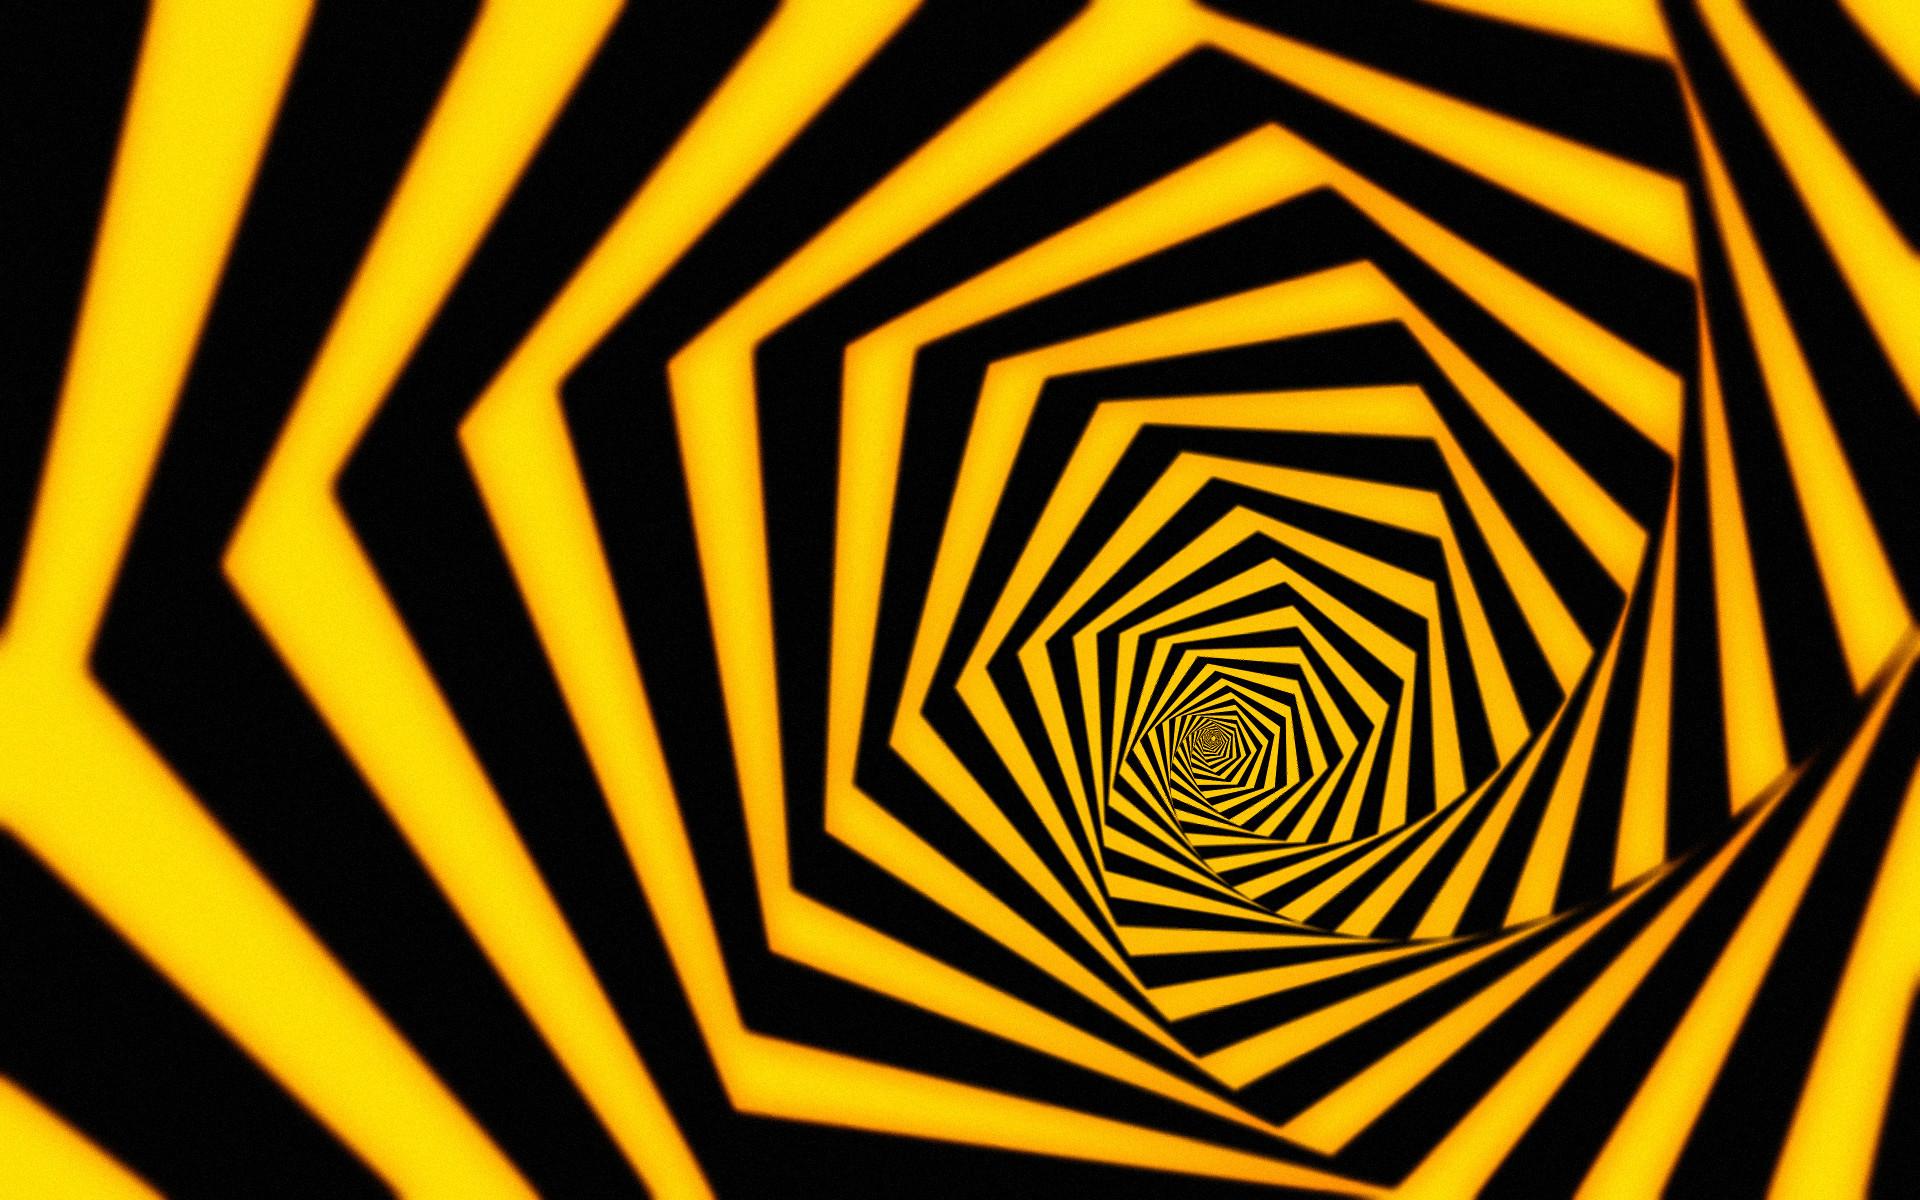 hypnosis-wallpaper